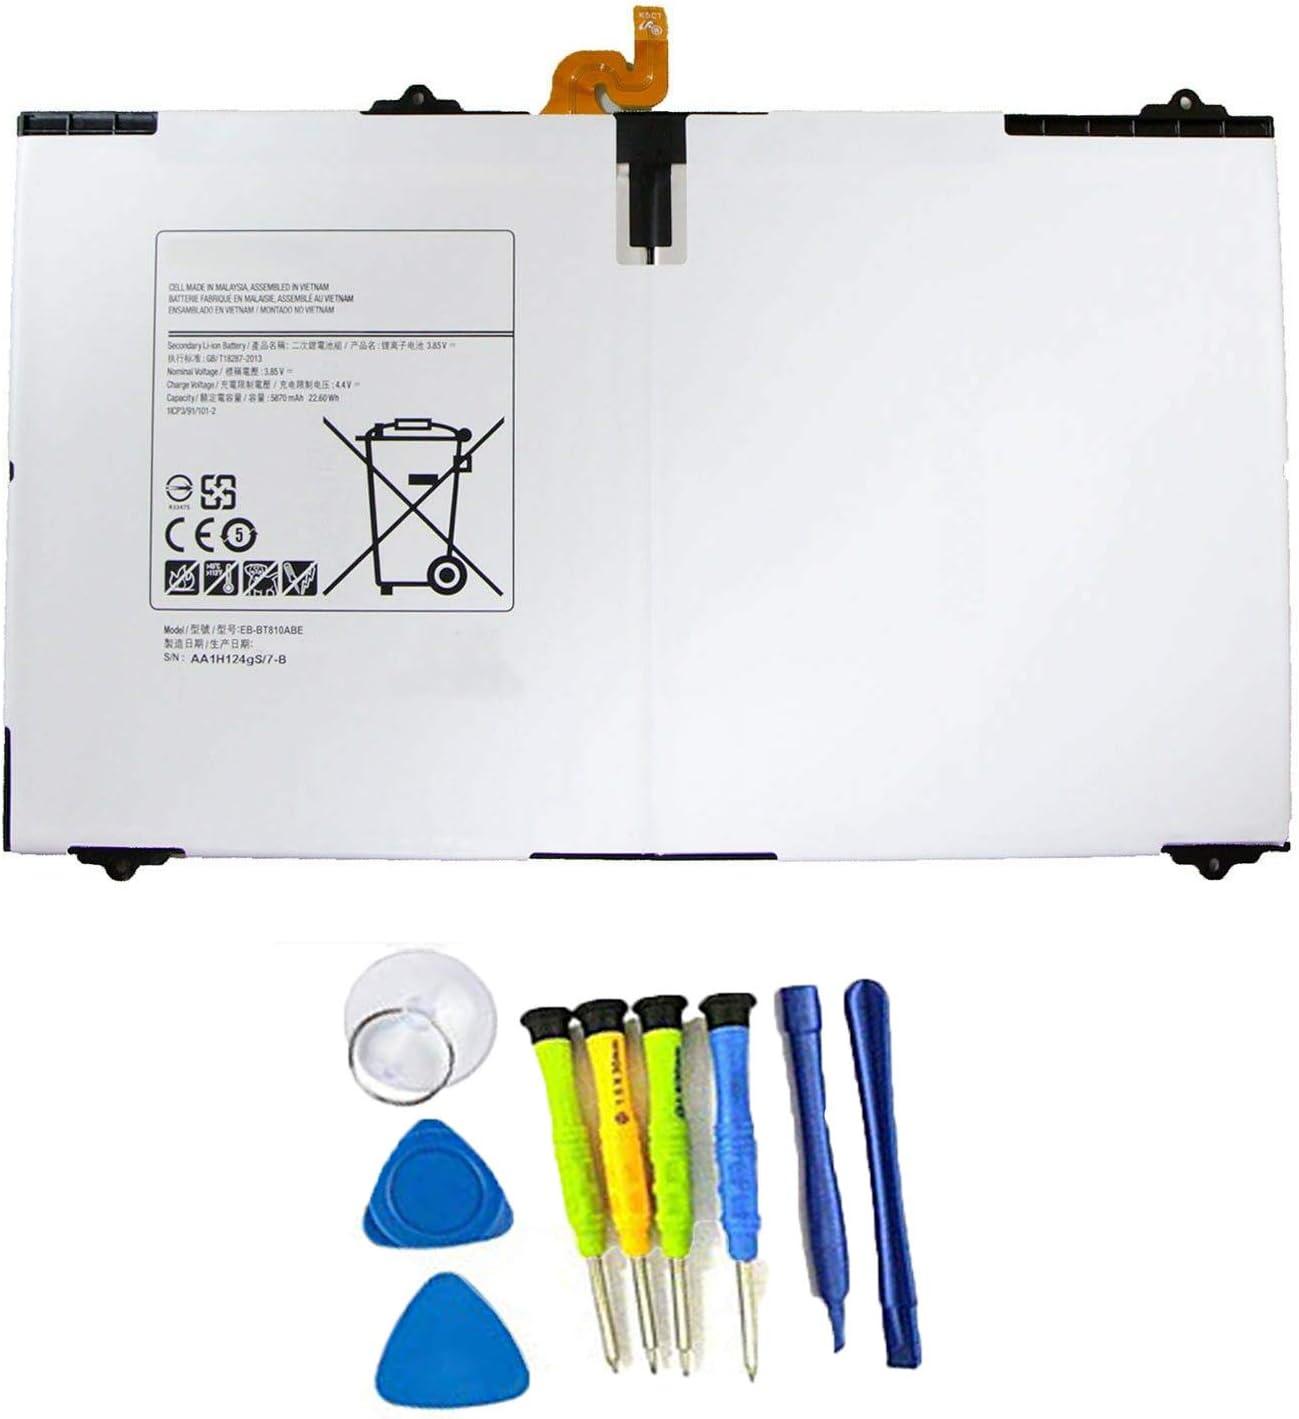 SUNNEAR EB-BT810ABE 5870mAh Tablet Battery for Samsung Galaxy Tab S2 9.7'' SM-T810 T810X T813 T815 T815C T815X T815Y T817 T817A T817W T817T T817P T817X T818 T819 Series Tablet with Tools EB-BT810ABA